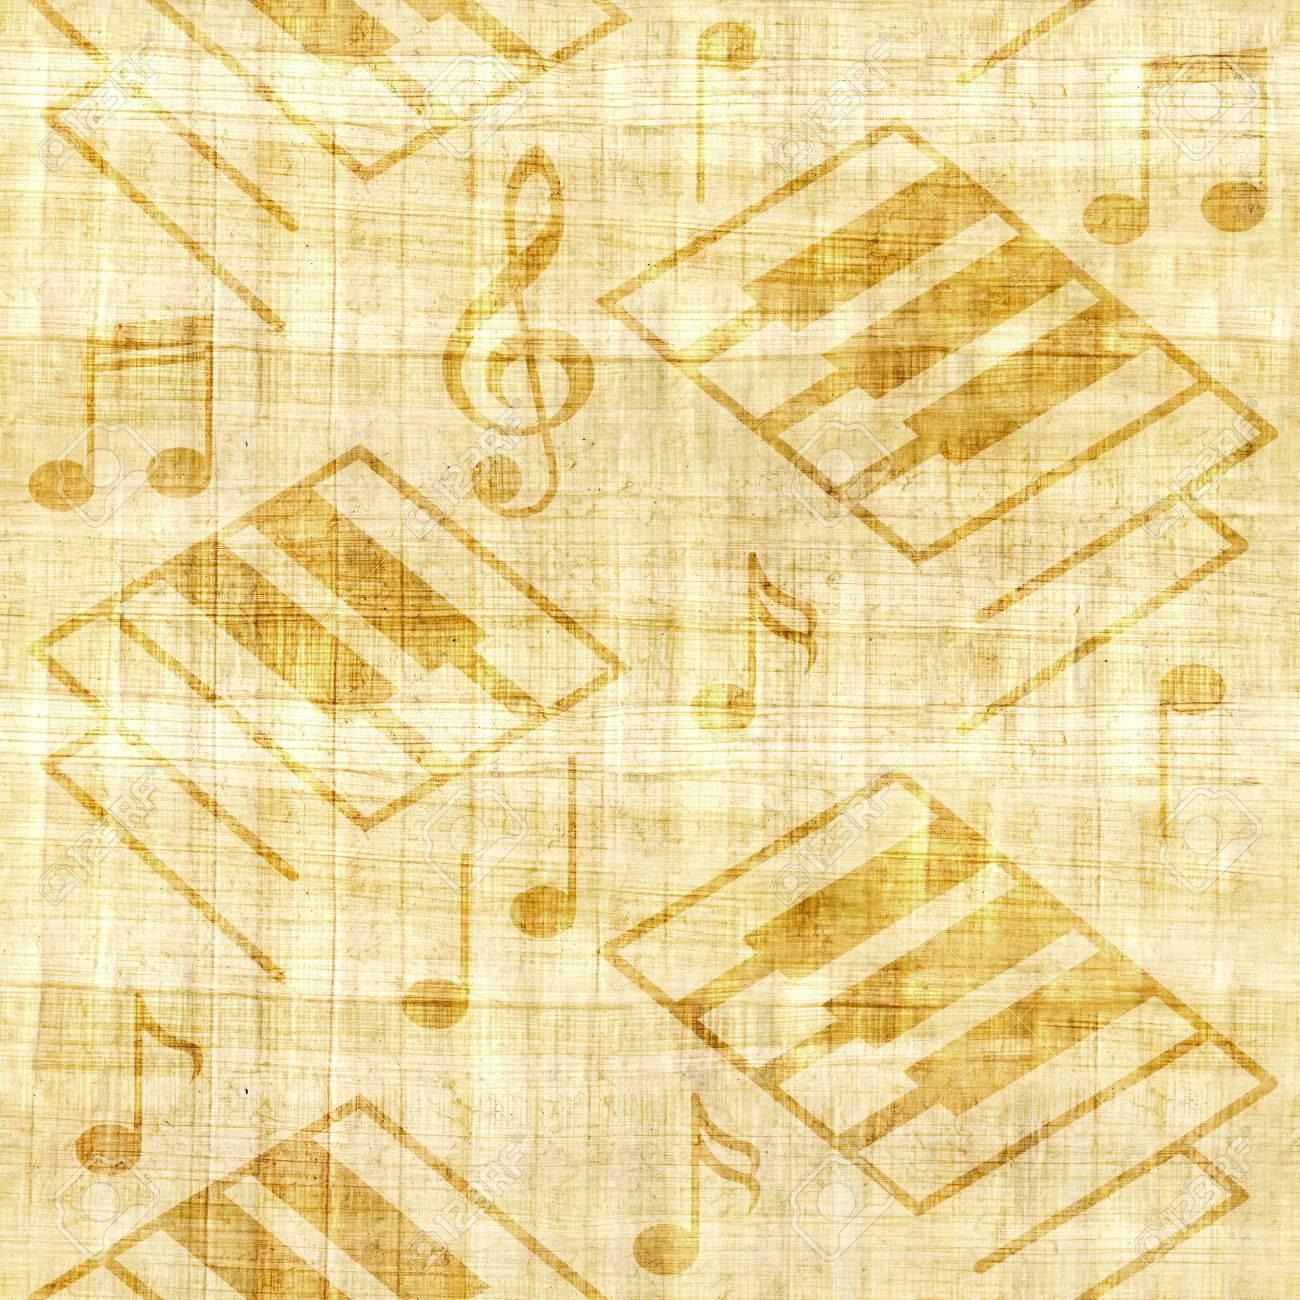 Abstract Decorative Piano Keys - Papyrus Texture - Seamless ...